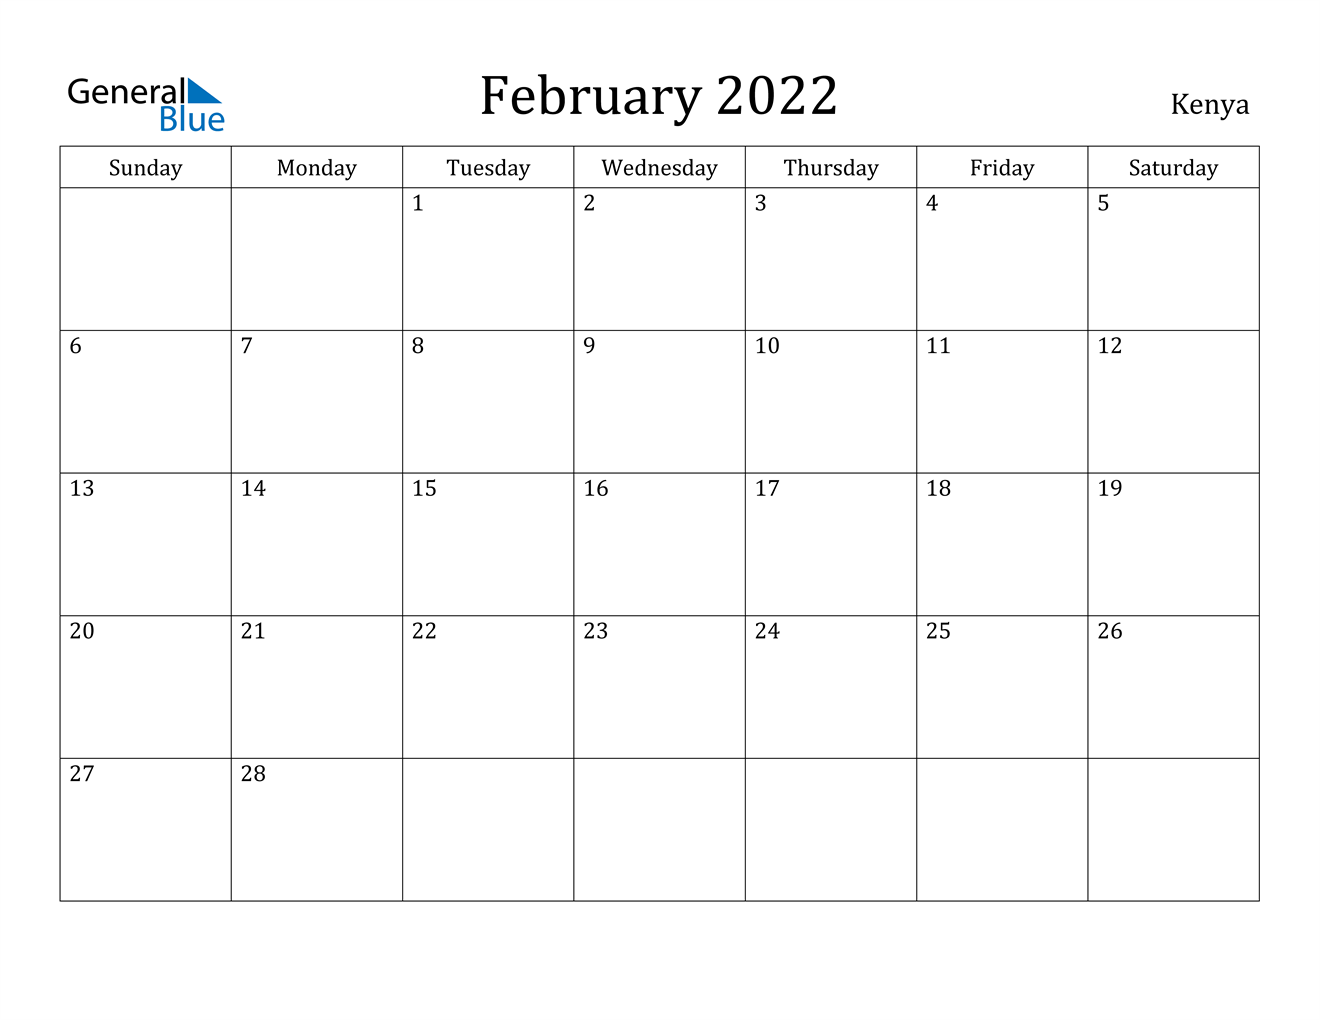 February 2022 Calendar With Holidays.Kenya February 2022 Calendar With Holidays